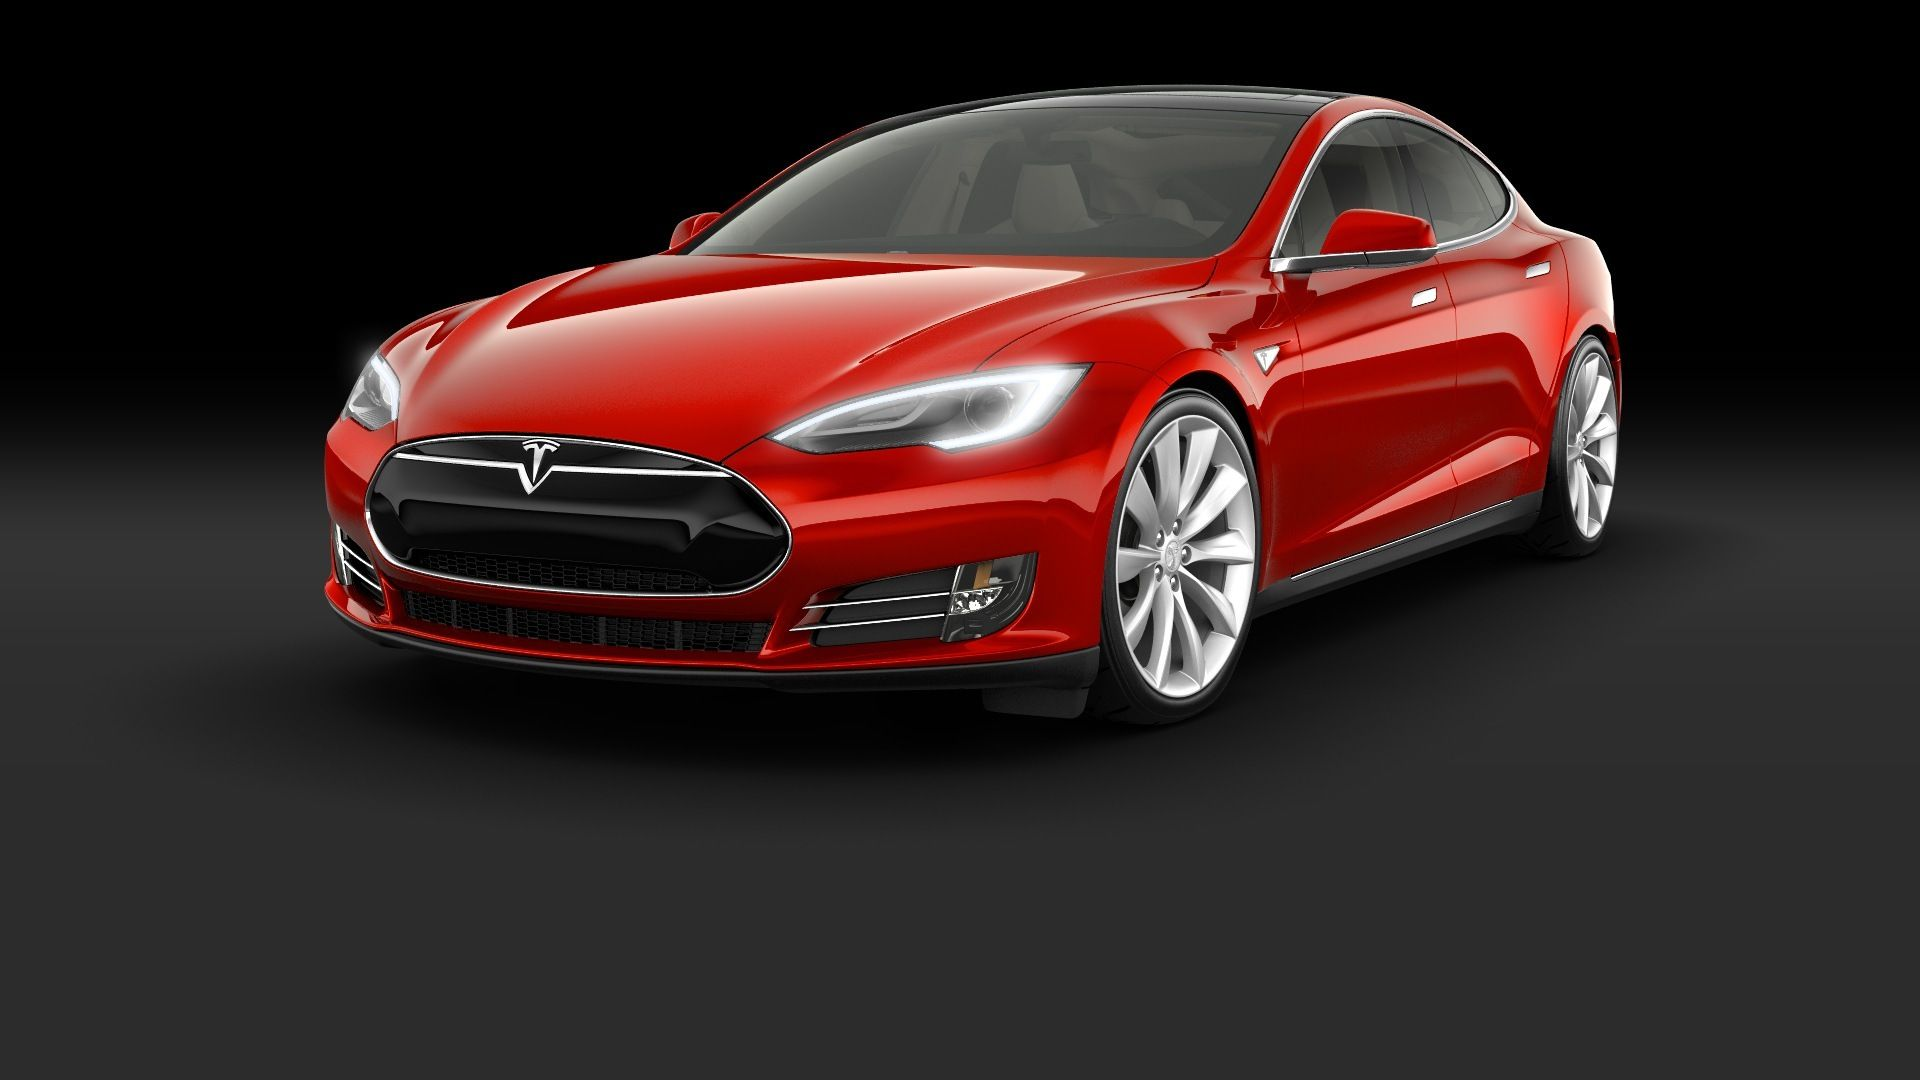 Tesla Model S Tesla model s, Tesla, Tesla motors